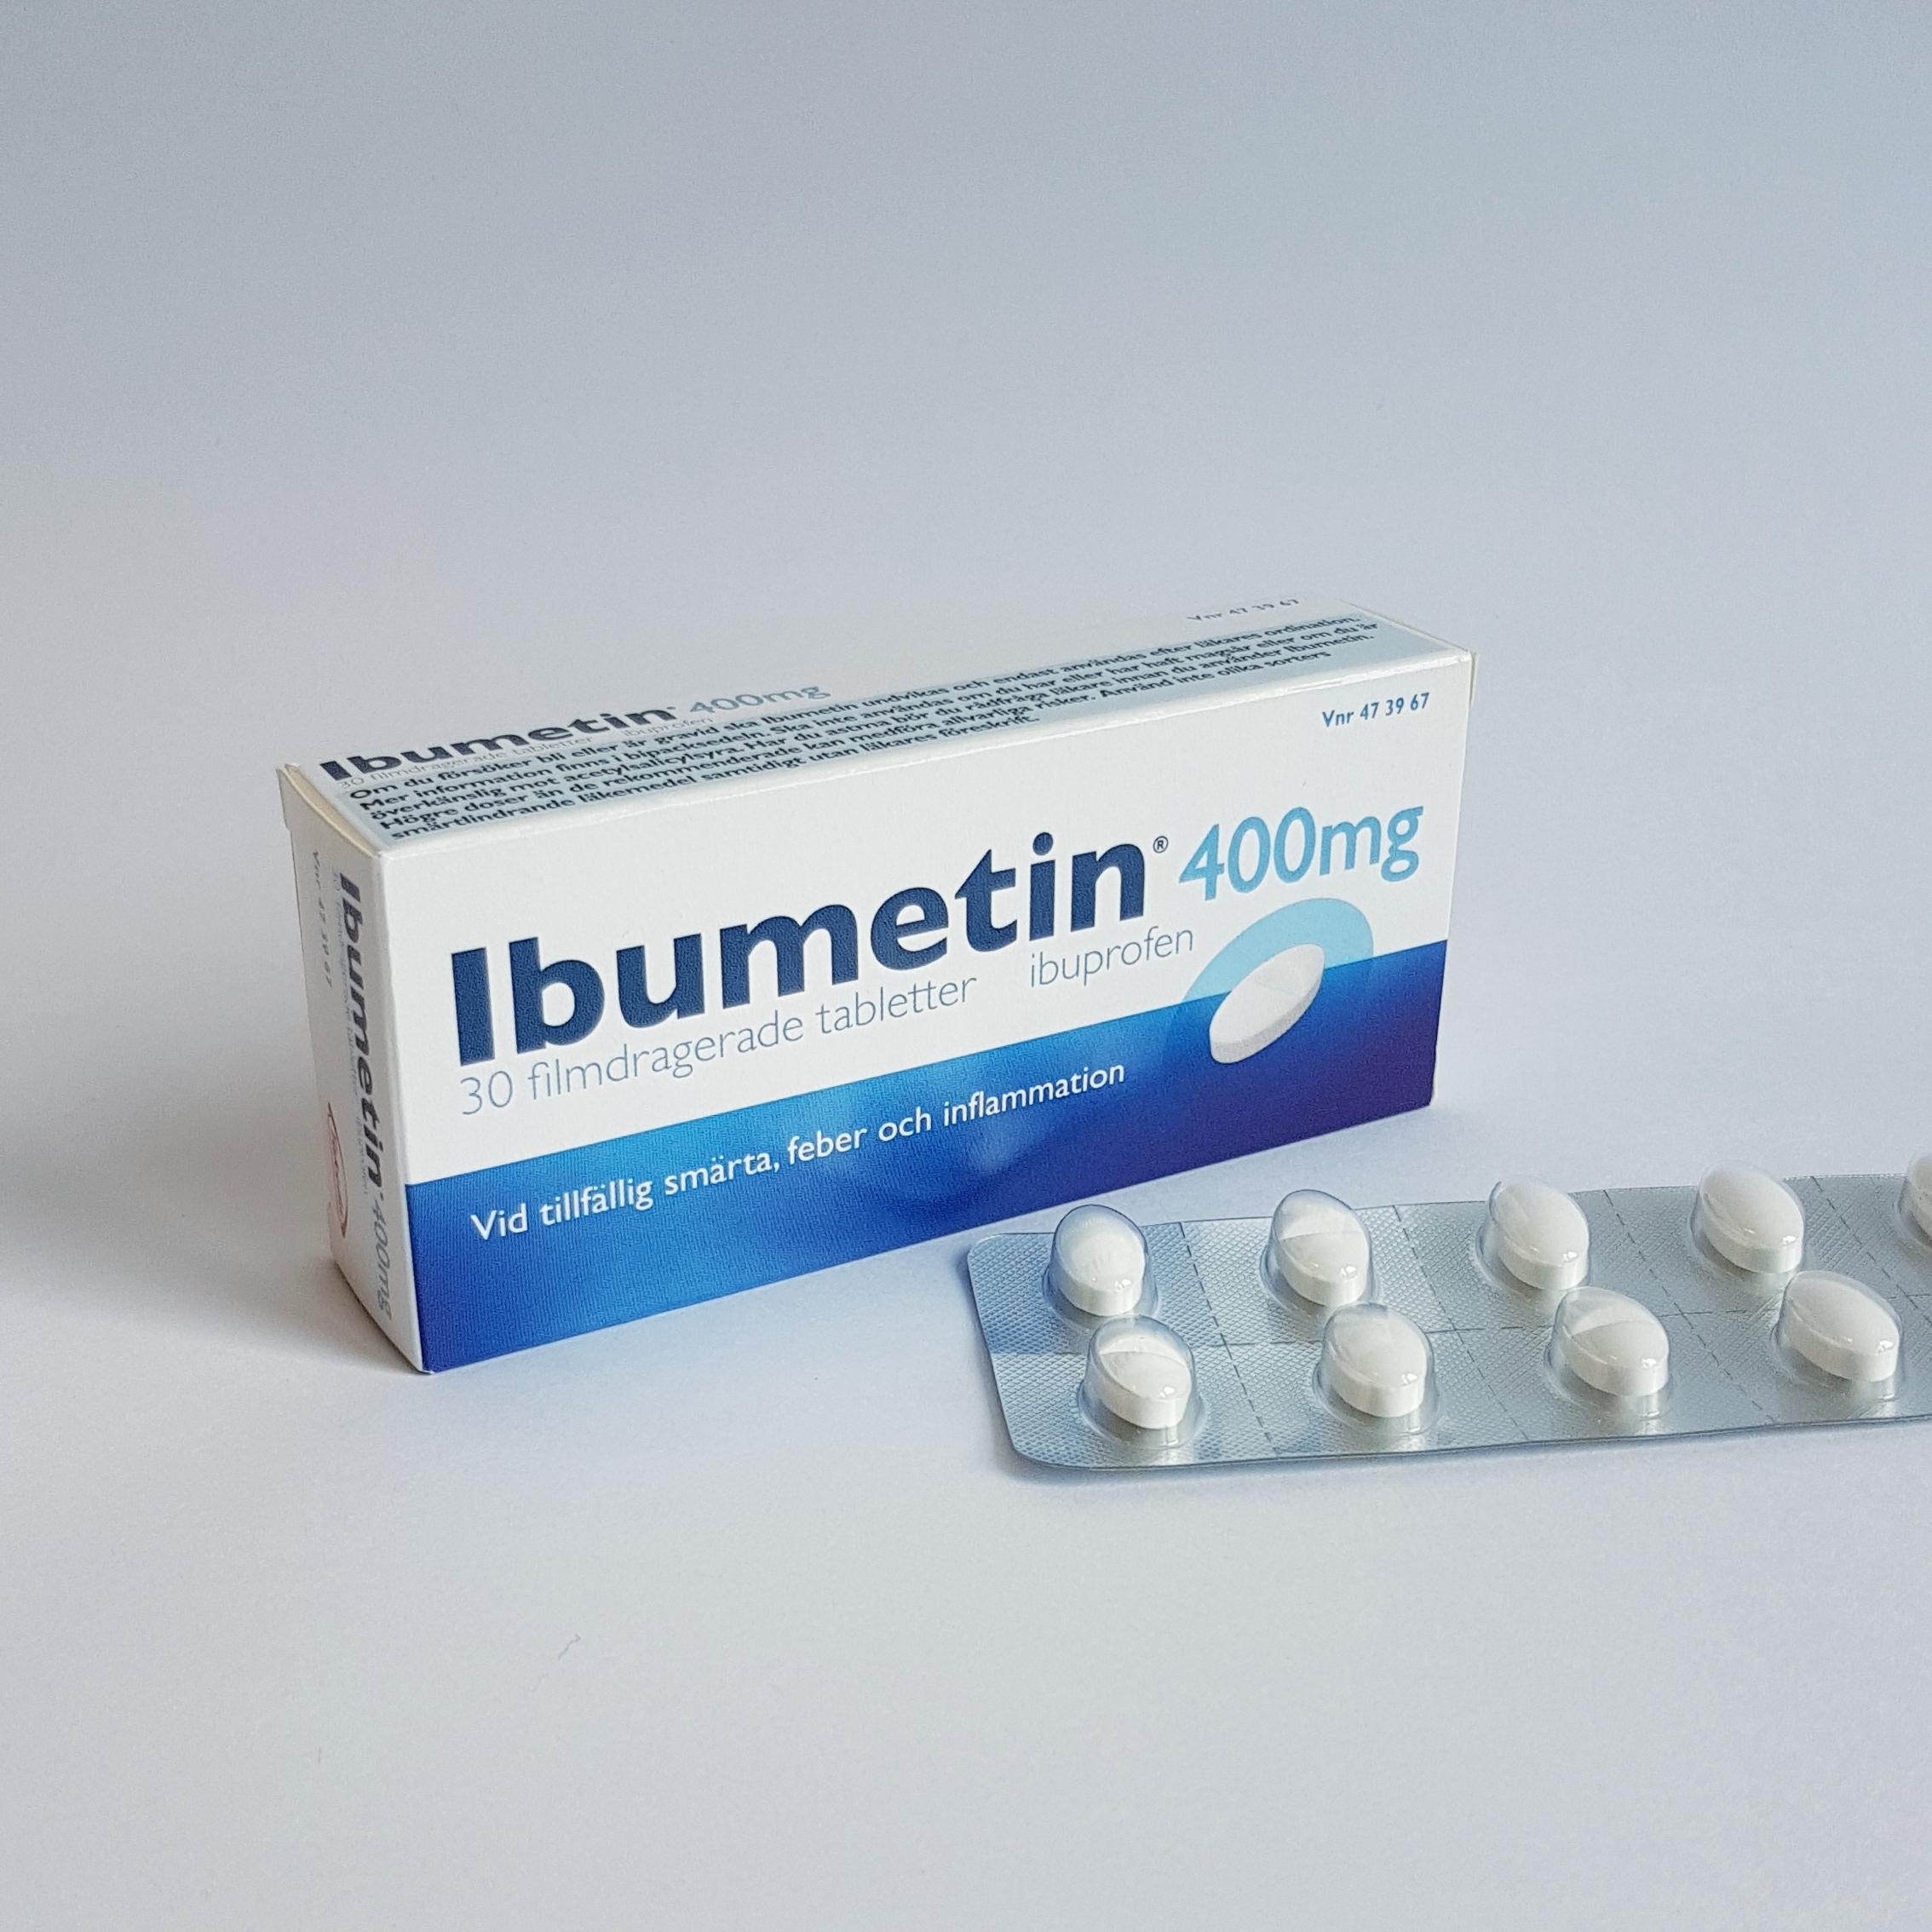 30 dagar tabletter